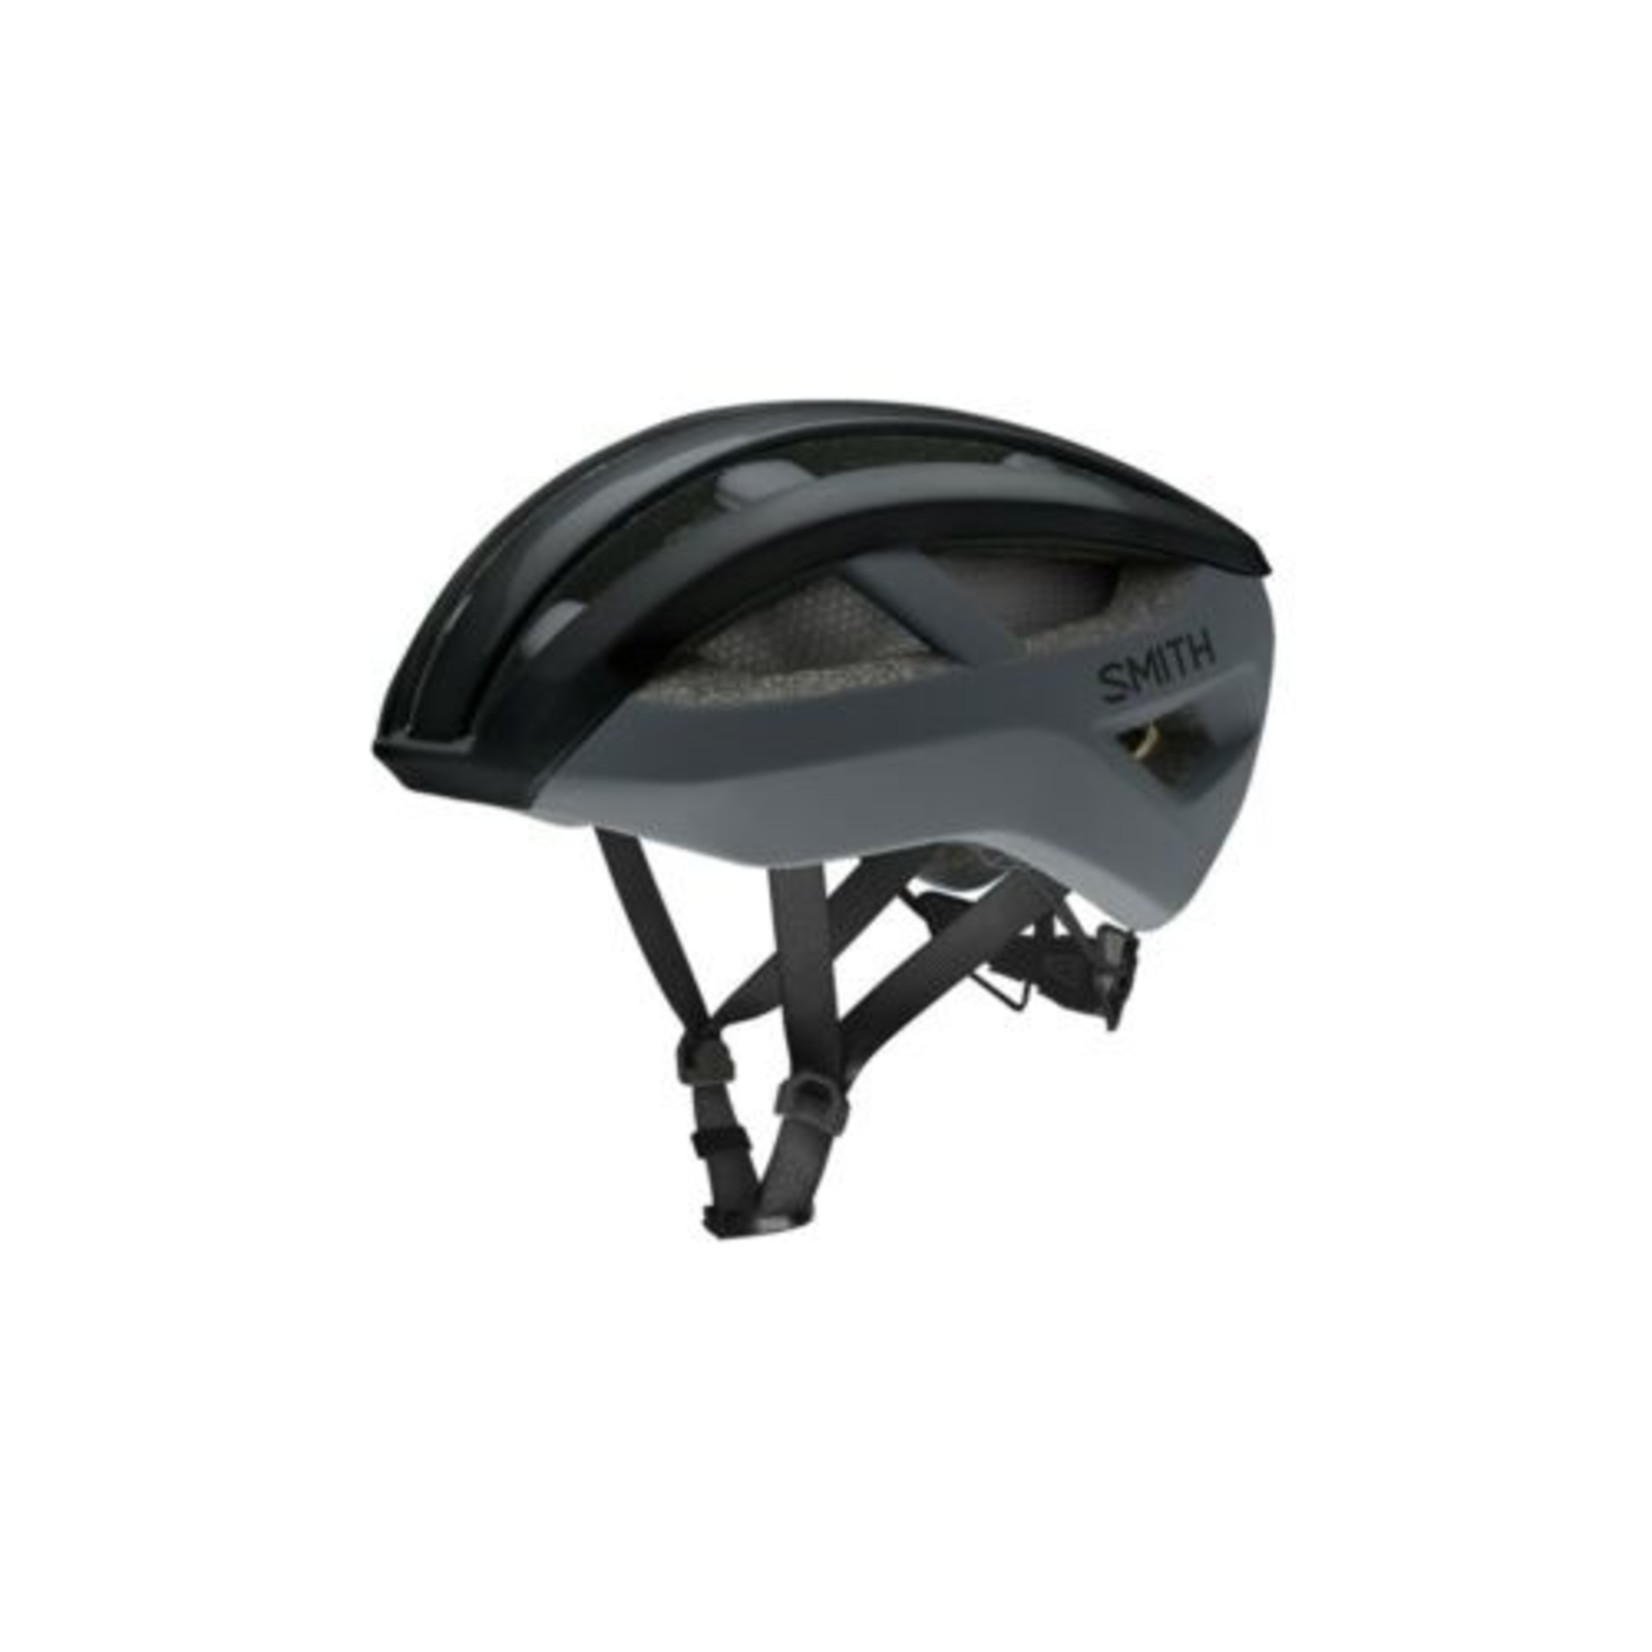 Smith Optics SMITH Optics Network MIPS Helmet with Aerocore featuring Koroyd (Black) LARGE